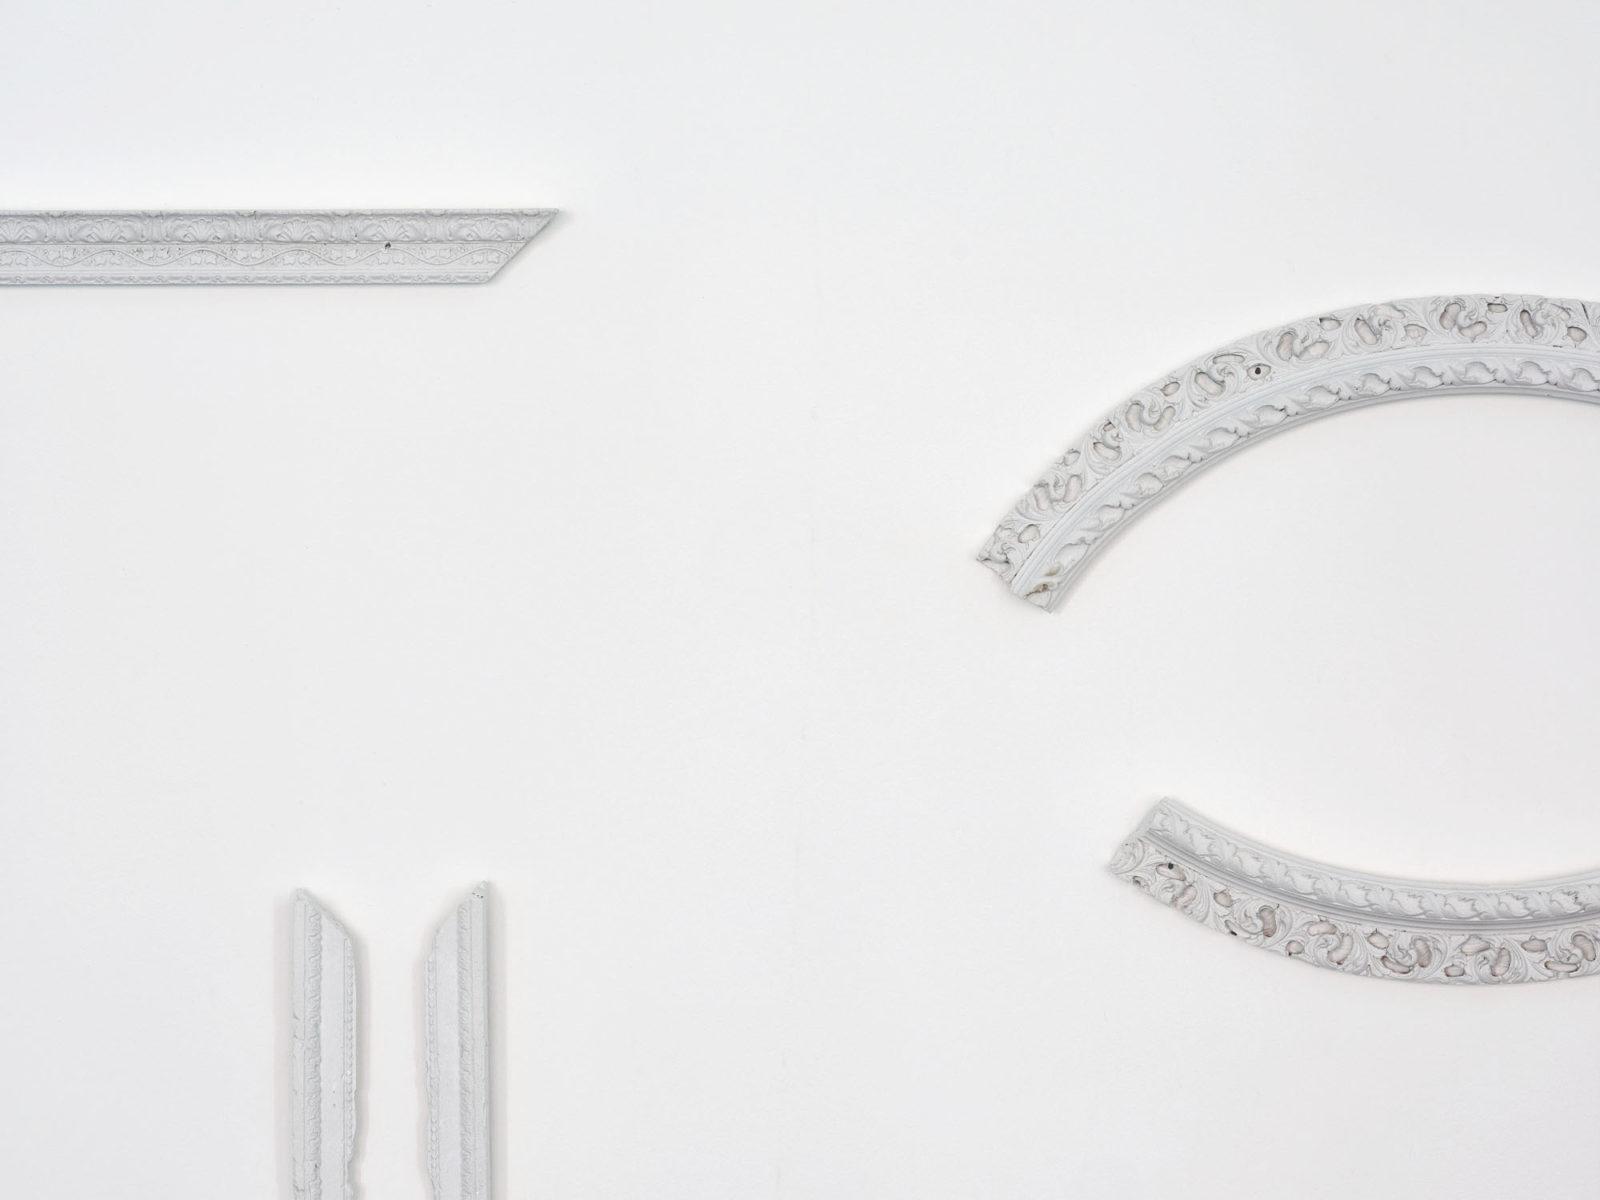 Penzo+Fiore, IlQuartoStato (det.), 2019, plaster frames, 2019, ph. G. Cecchinato